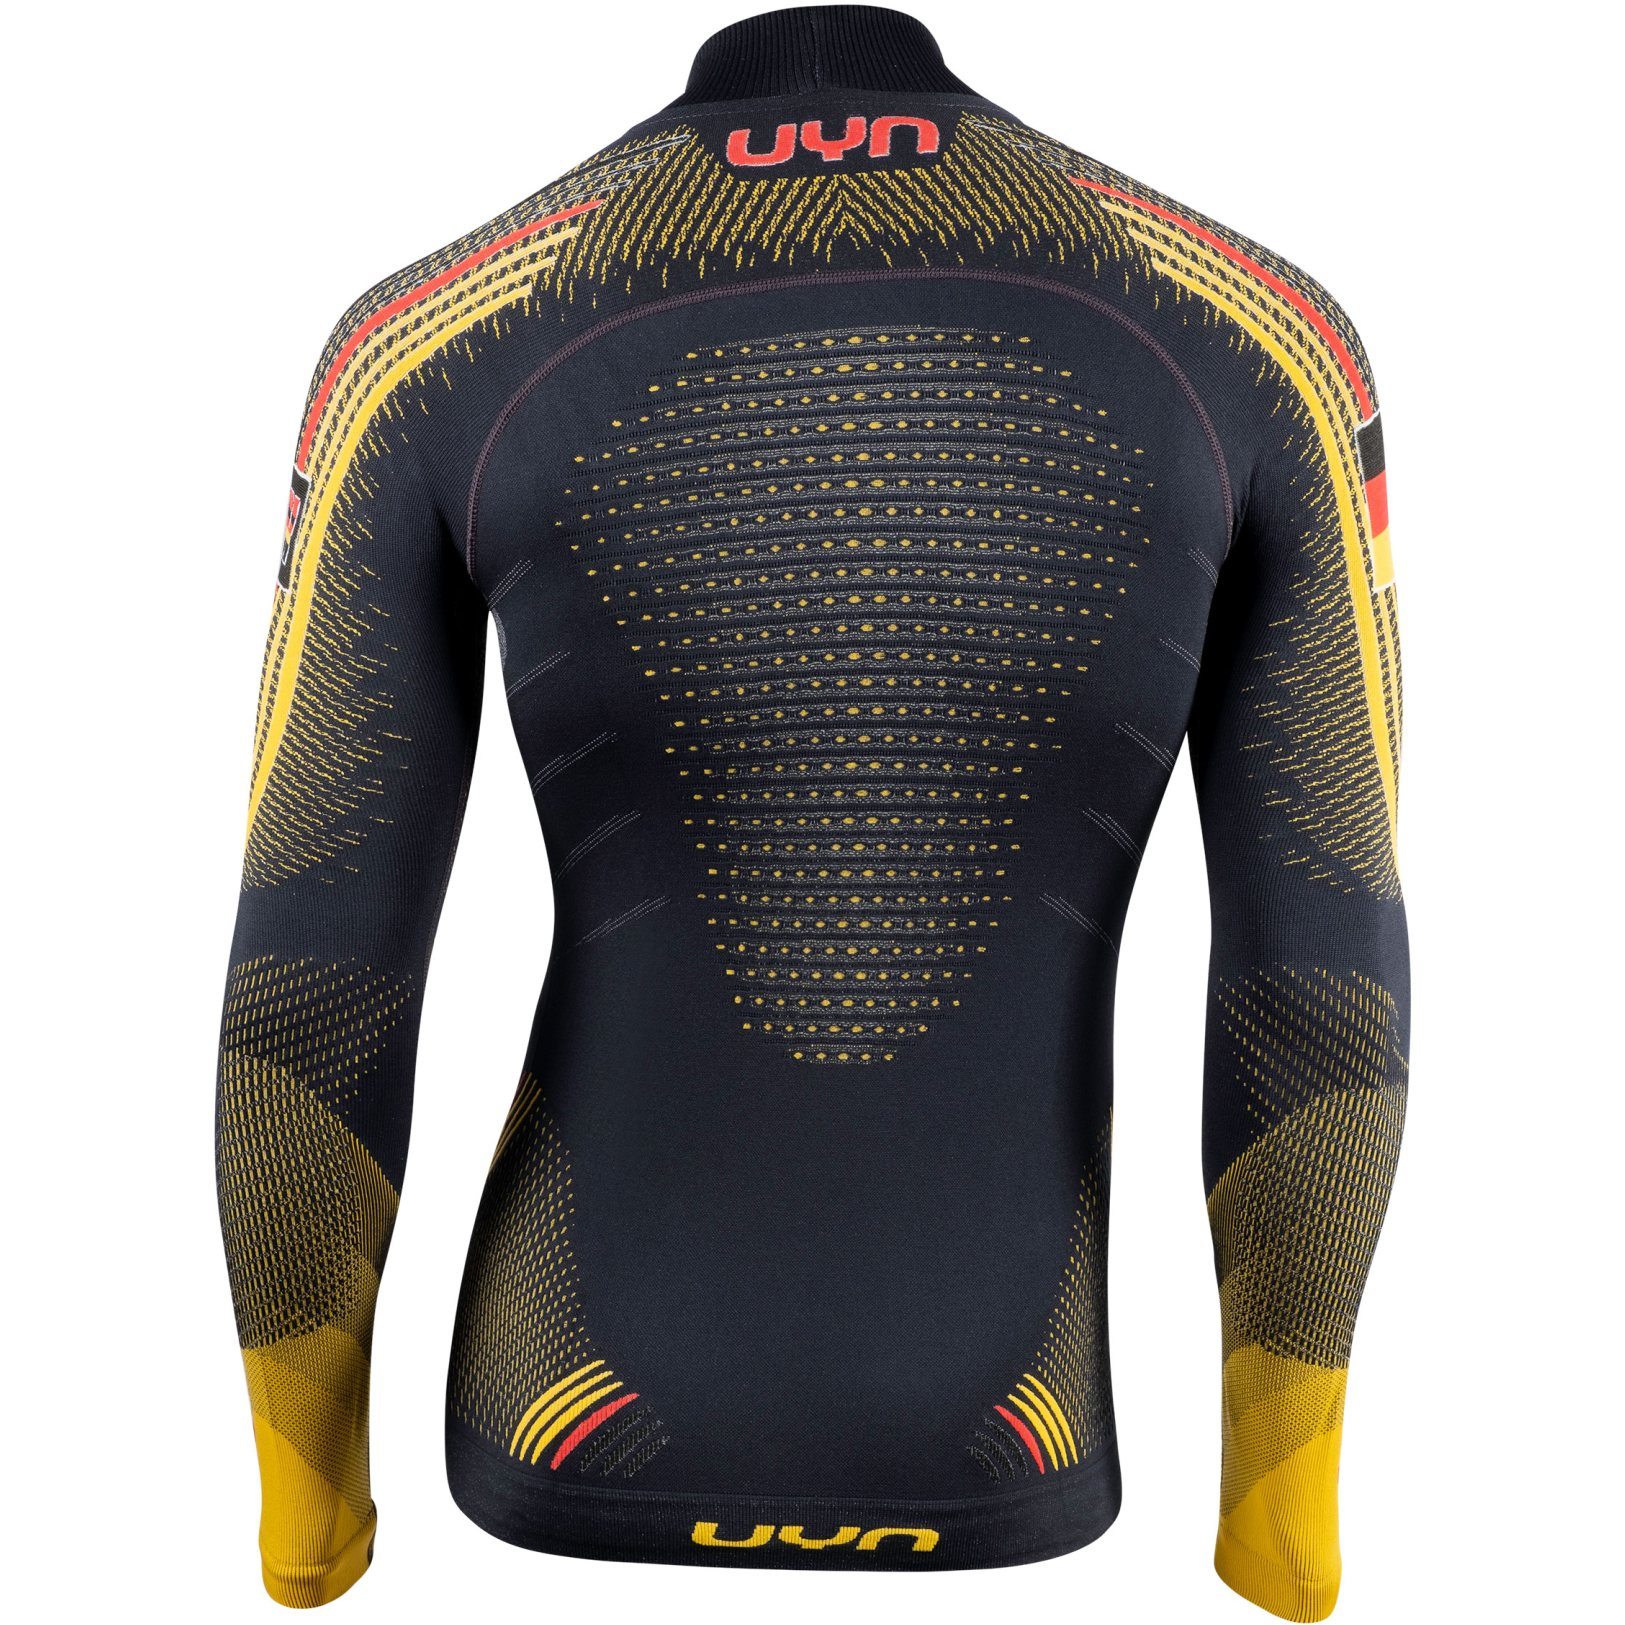 Image of UYN Natyon 2.0 Underwear Turtle Neck Shirt Kids - Germany